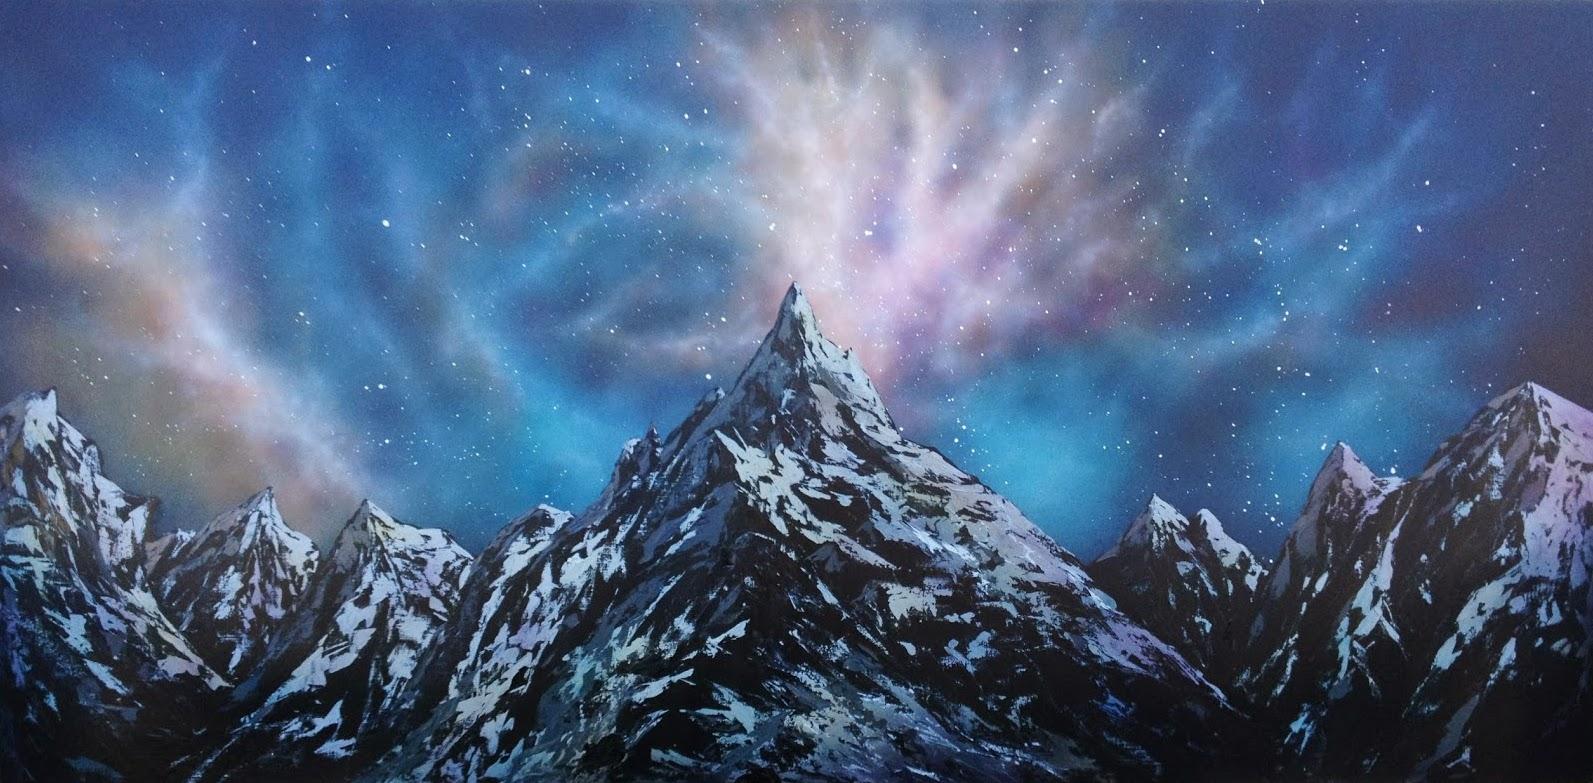 'Mountain' Acrylic on Board (90 x 185cm)